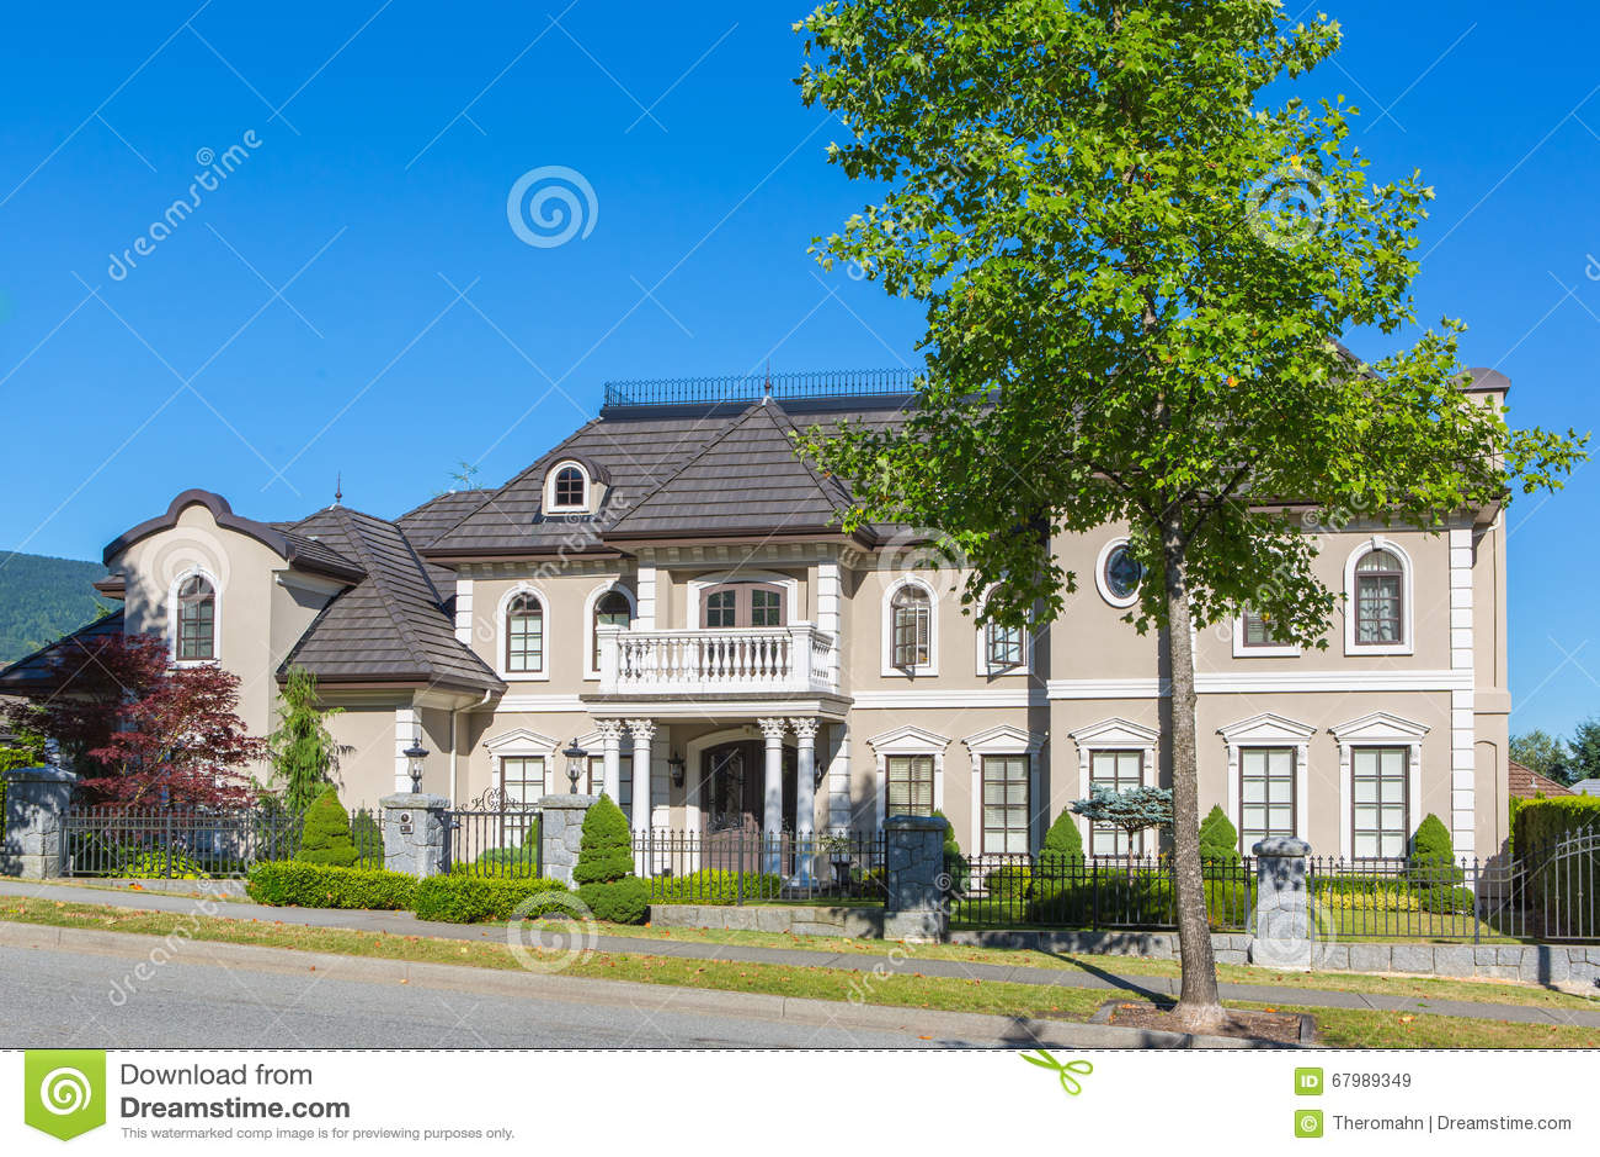 Custom Built House Stock Photo Image 67989349